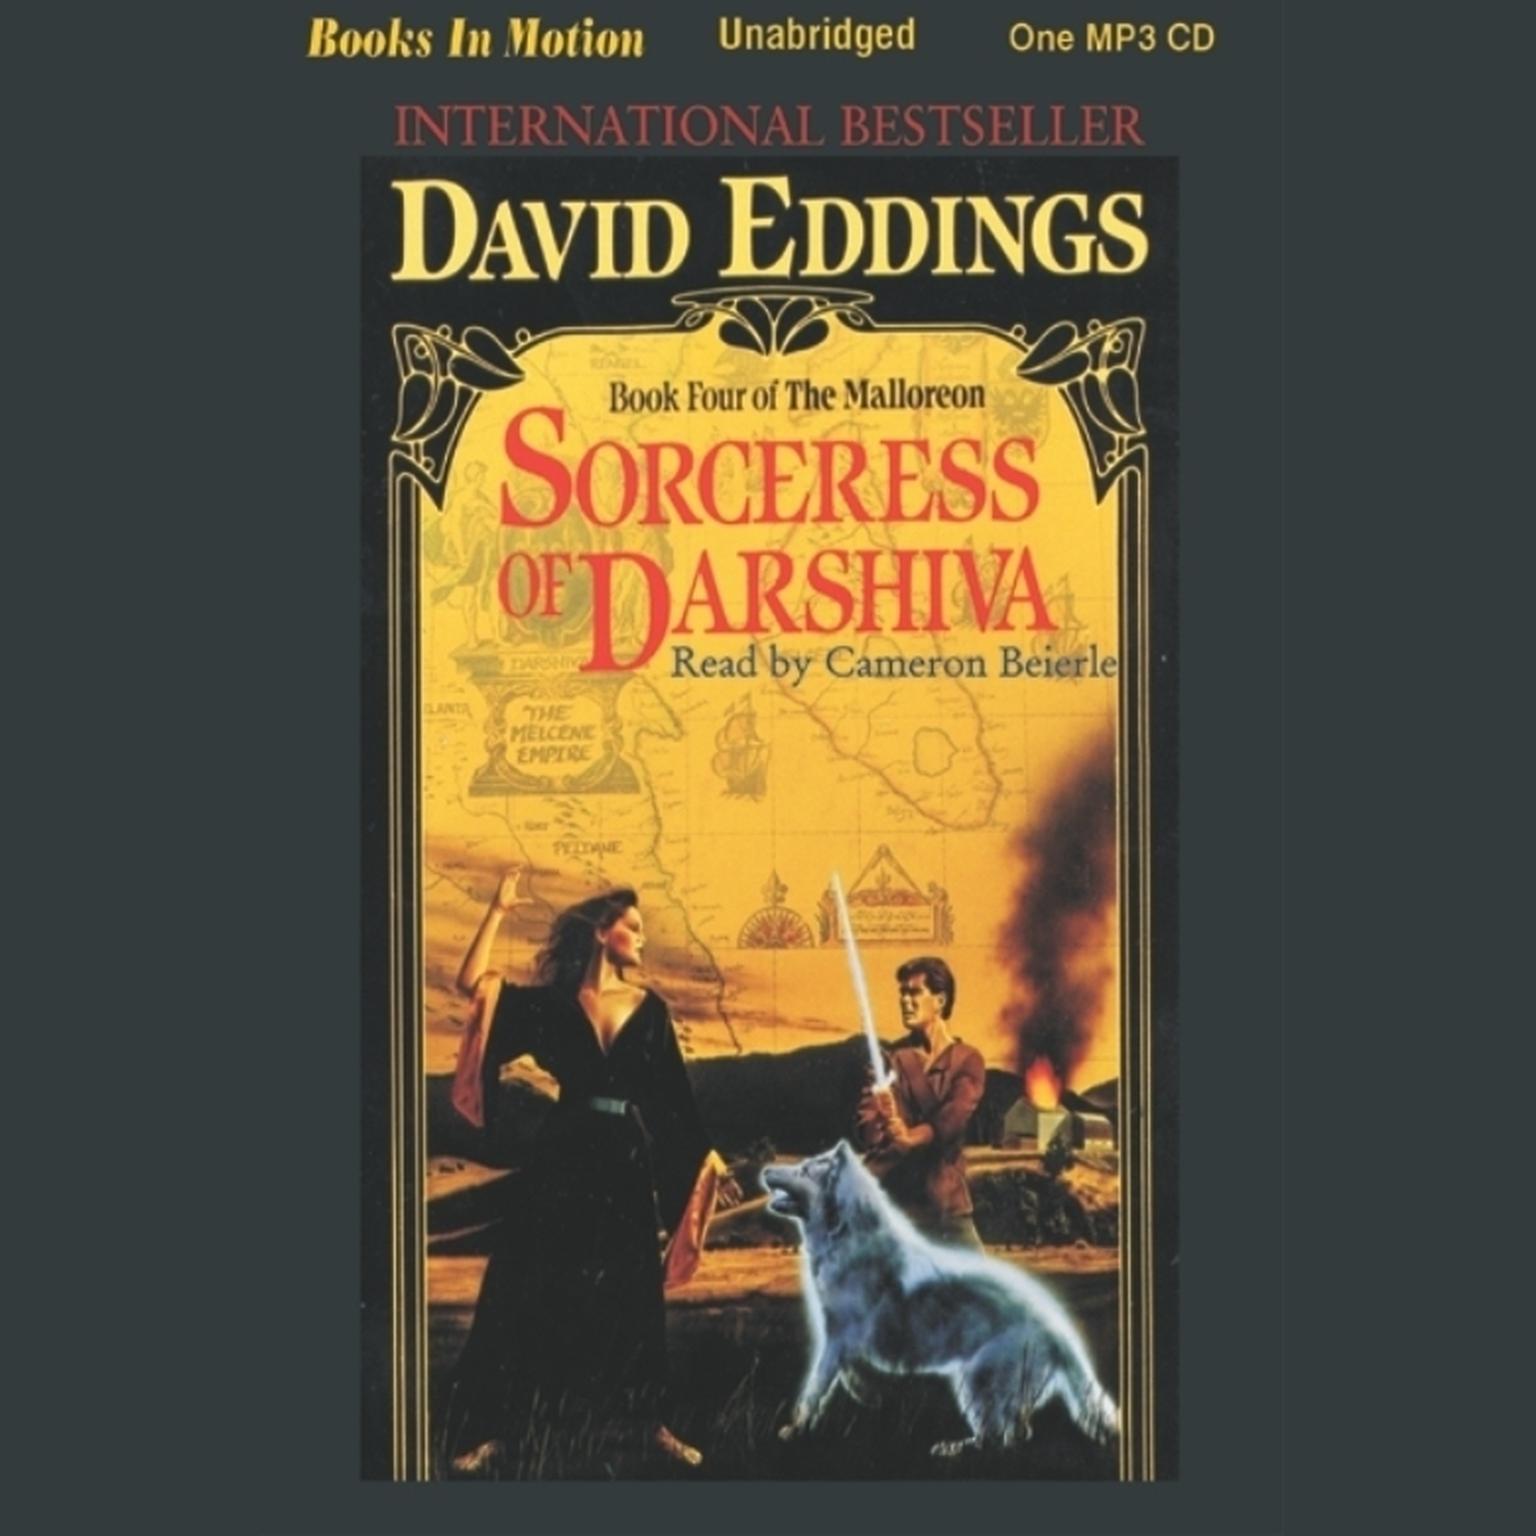 Sorceress of Darshiva Audiobook, by David Eddings